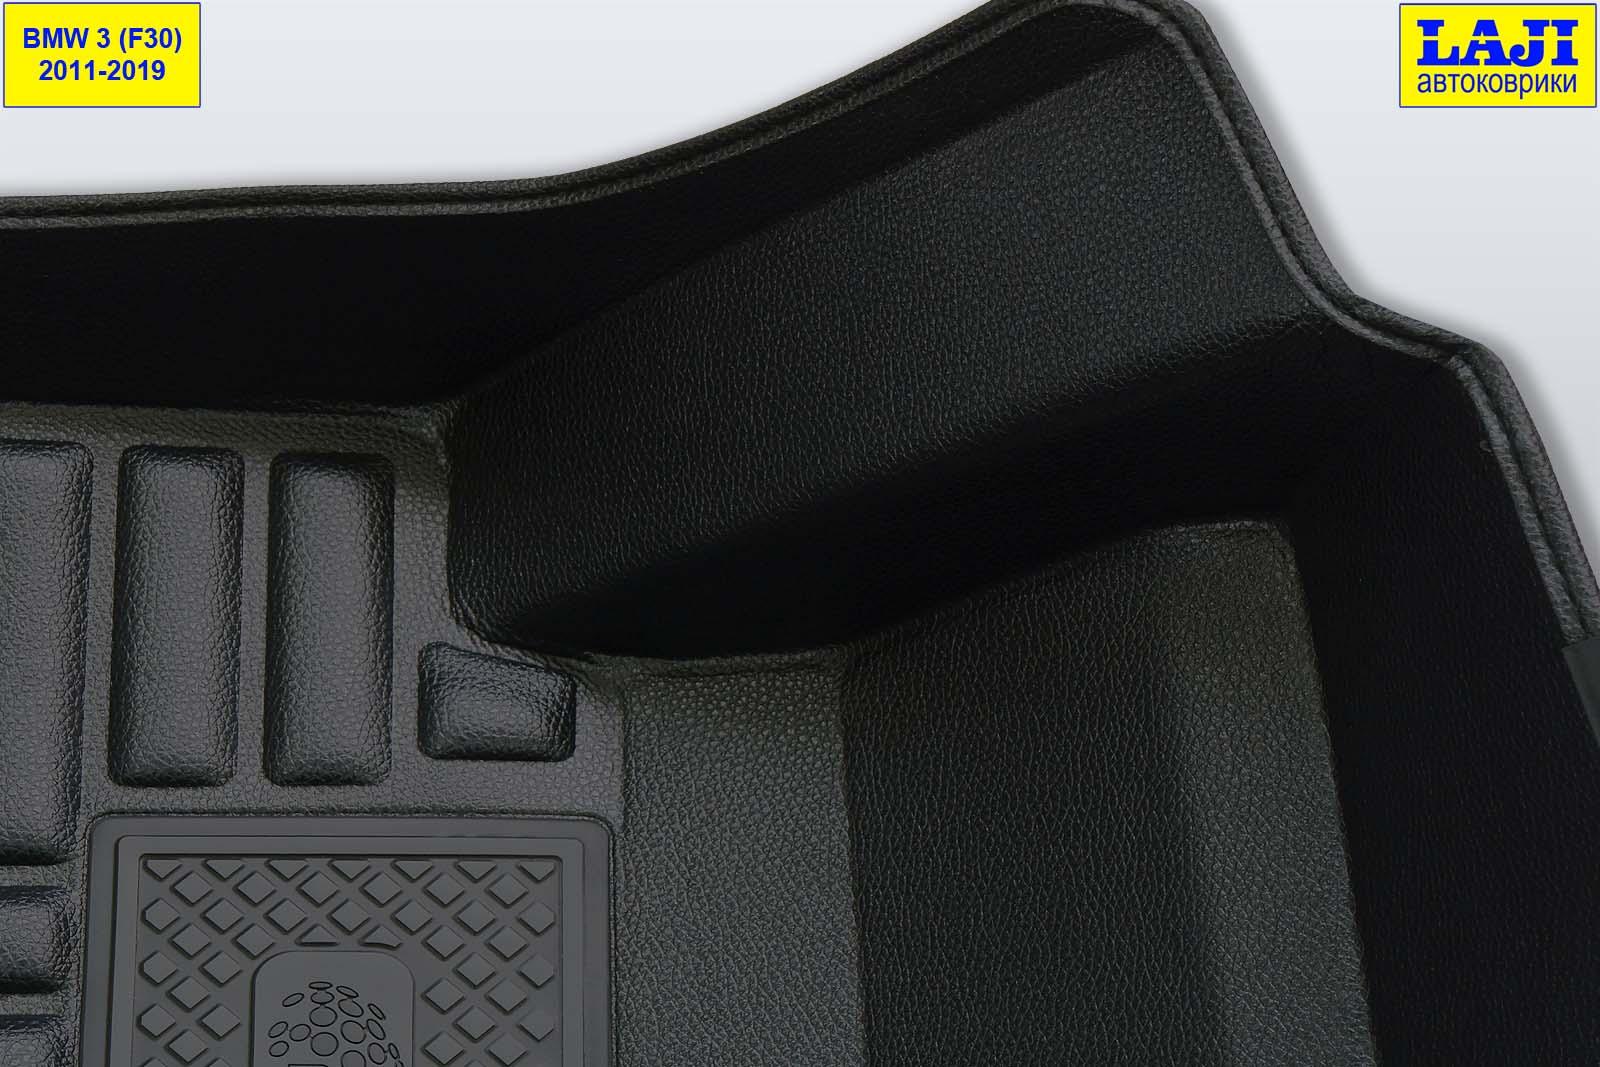 5D коврики в салон BMW 3 серии F30 2011-2018 6